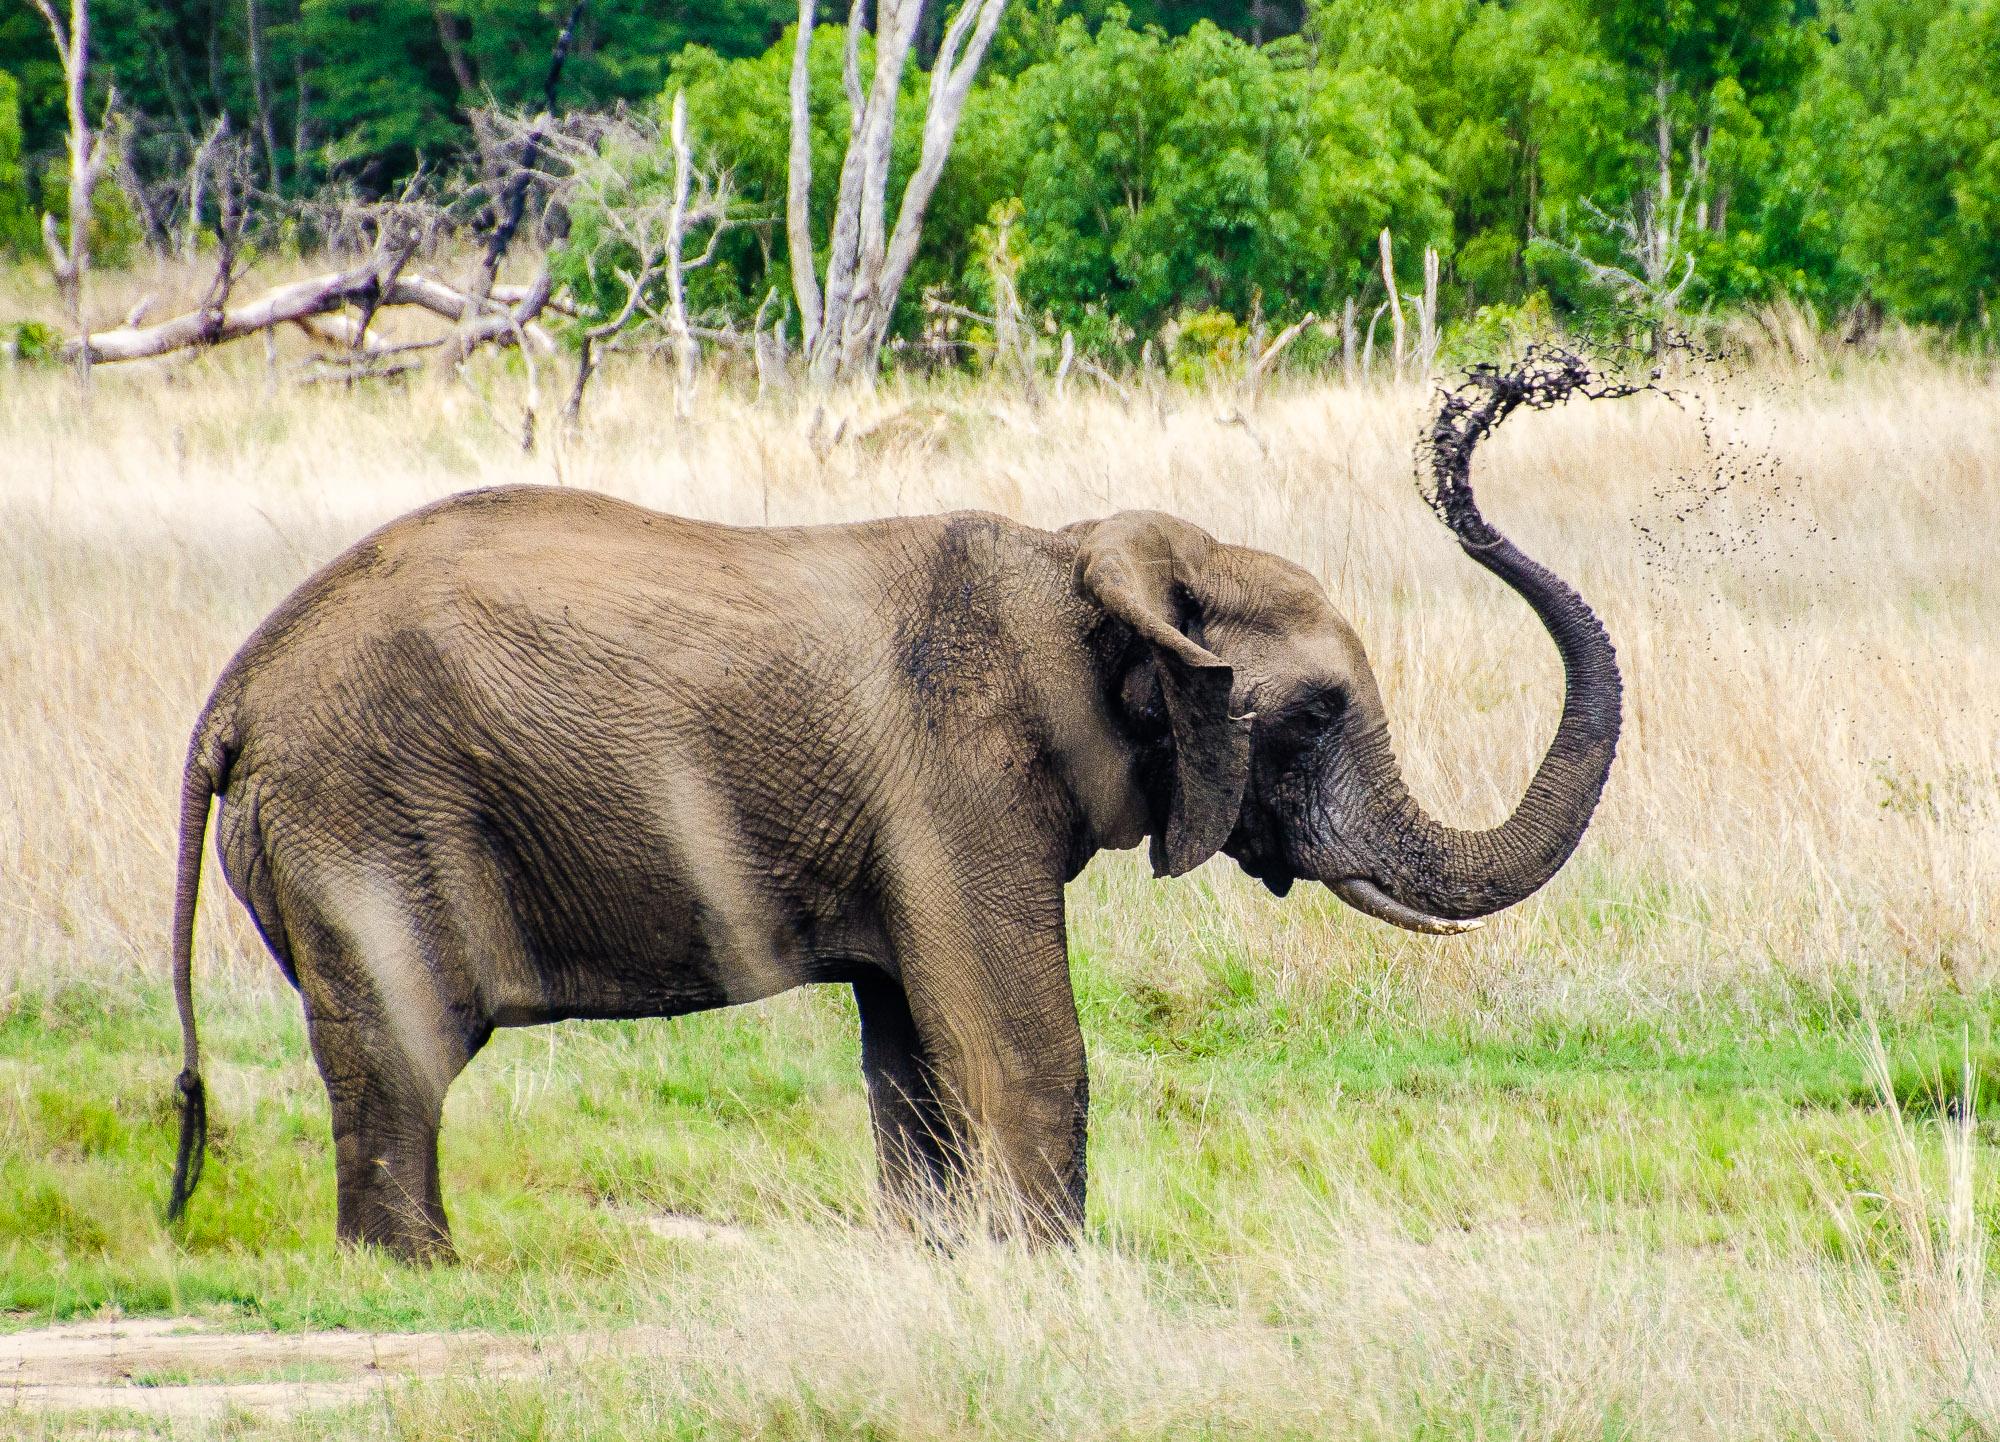 elephant - parc national de hwange - Zimbabwe, les chutes Victoria et plus encore! - afrique, zimbabwe